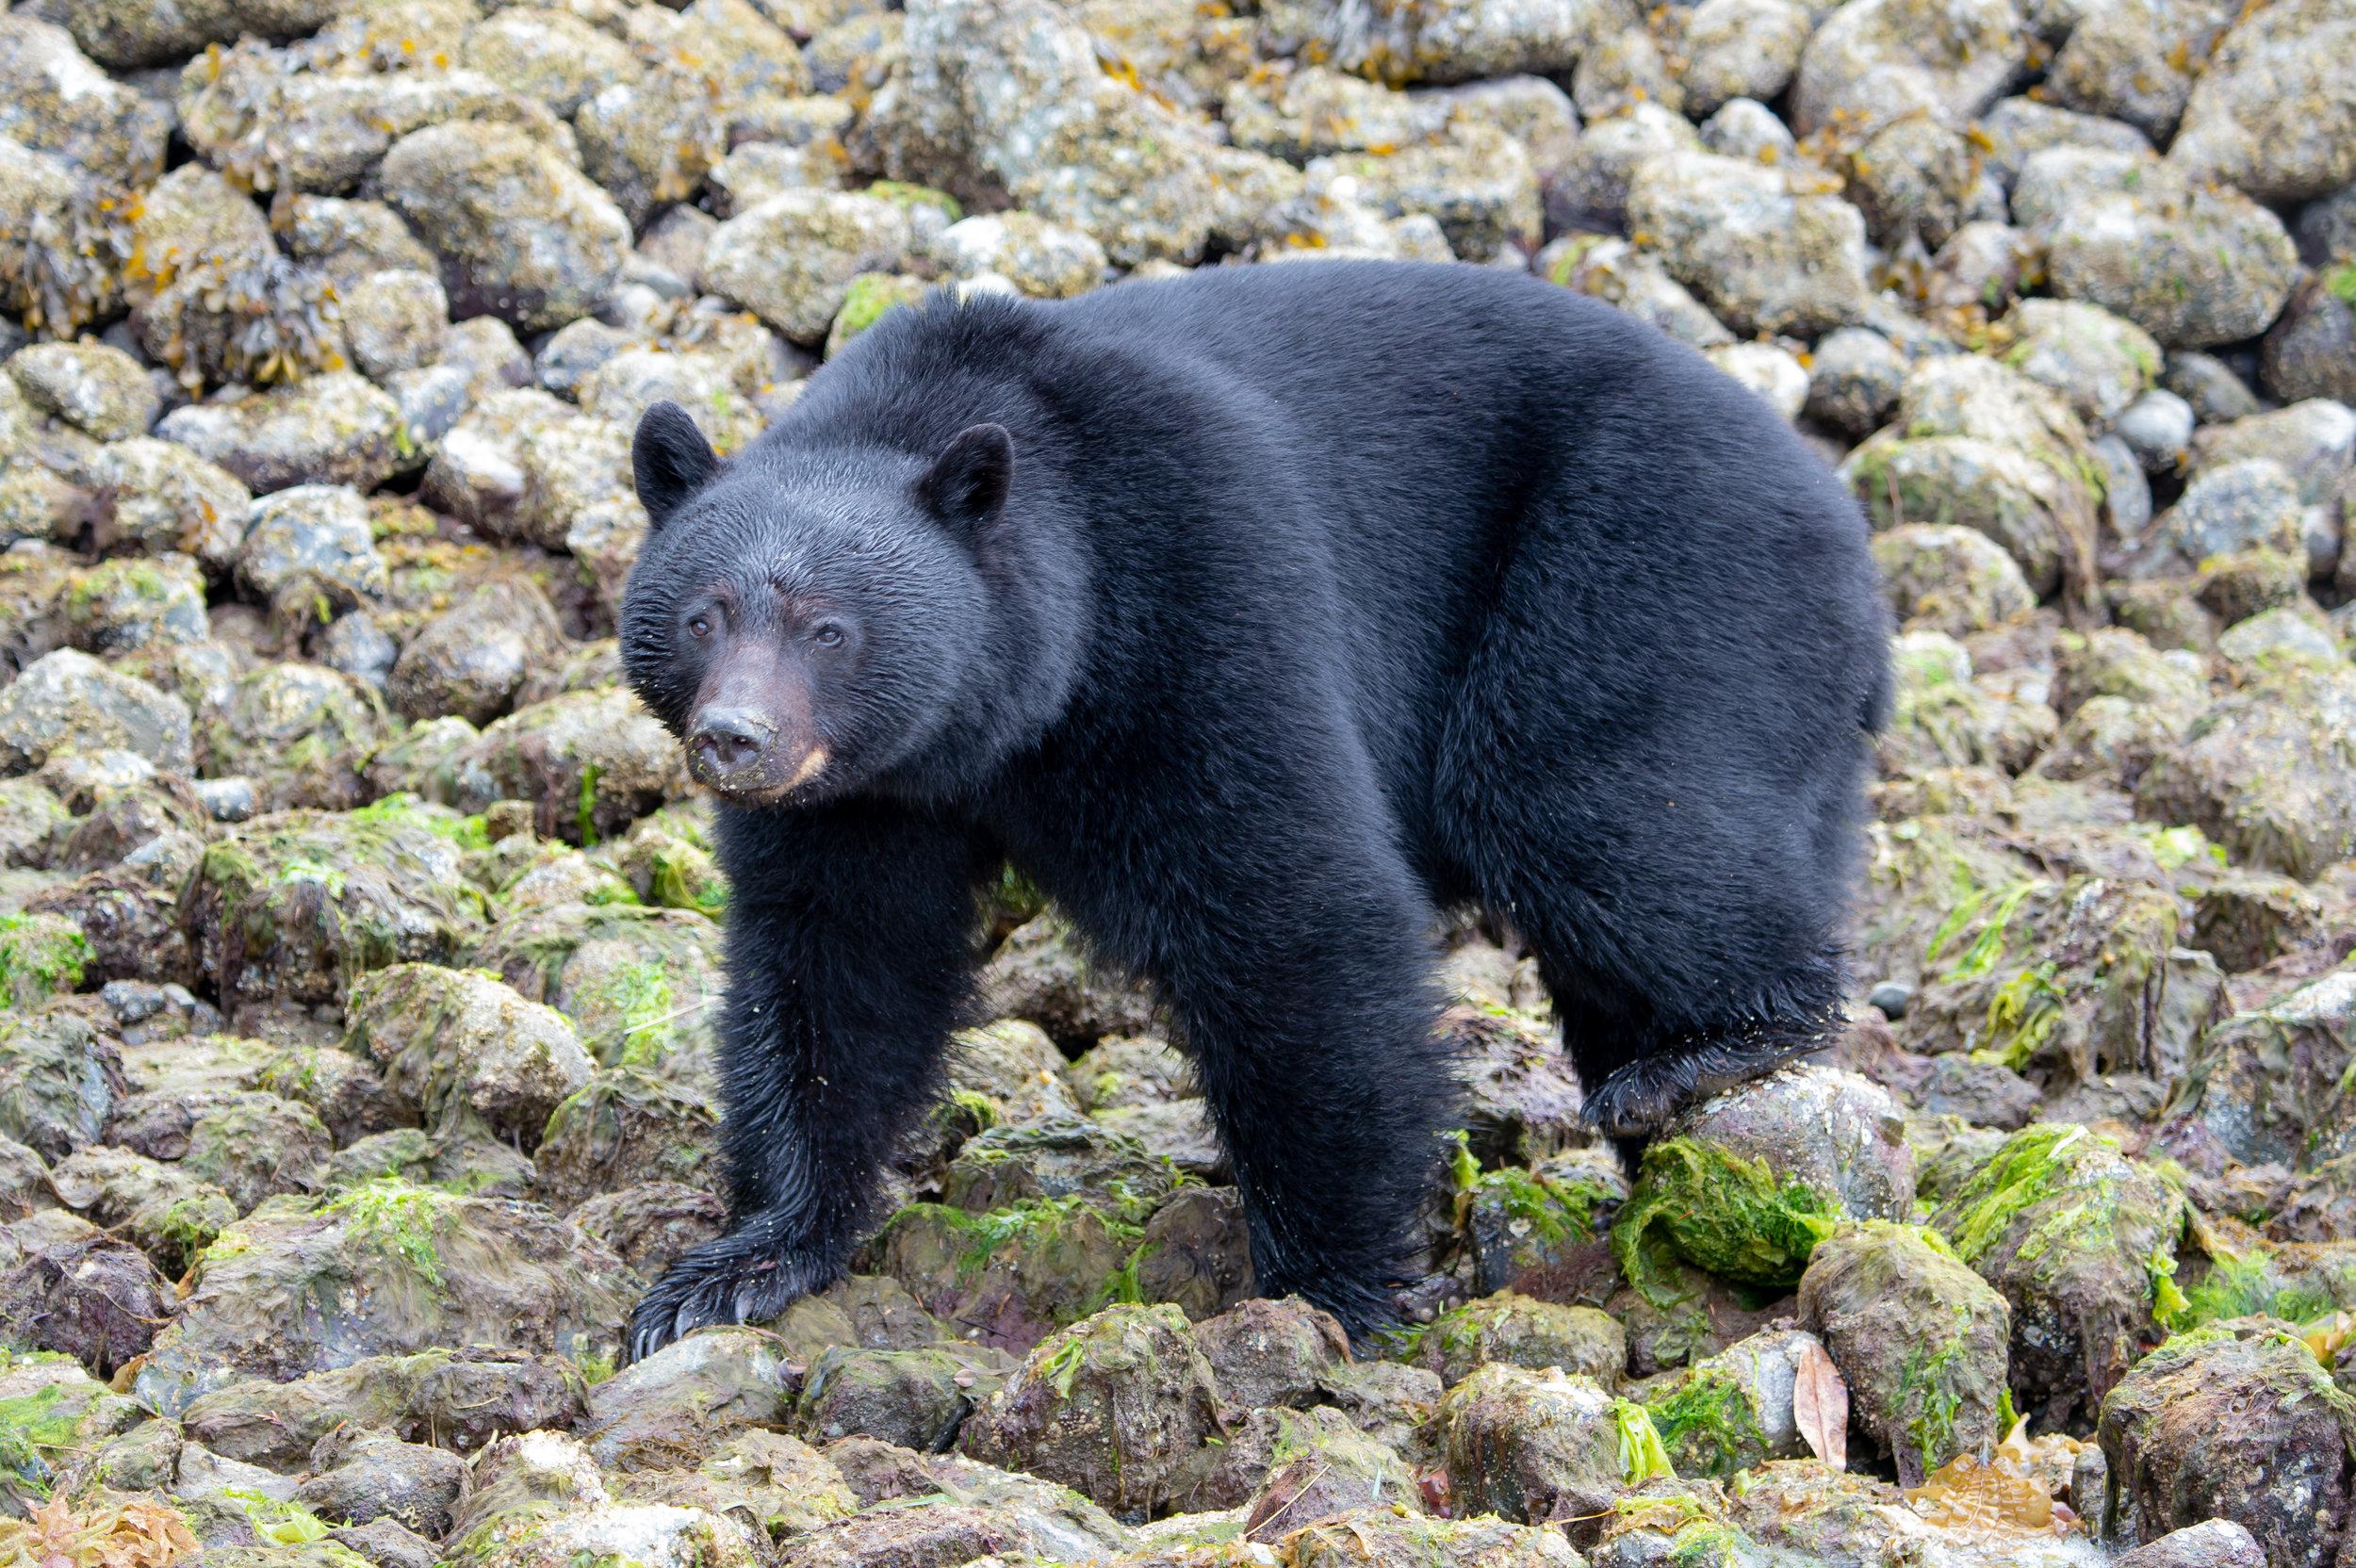 Bear Watching Tours